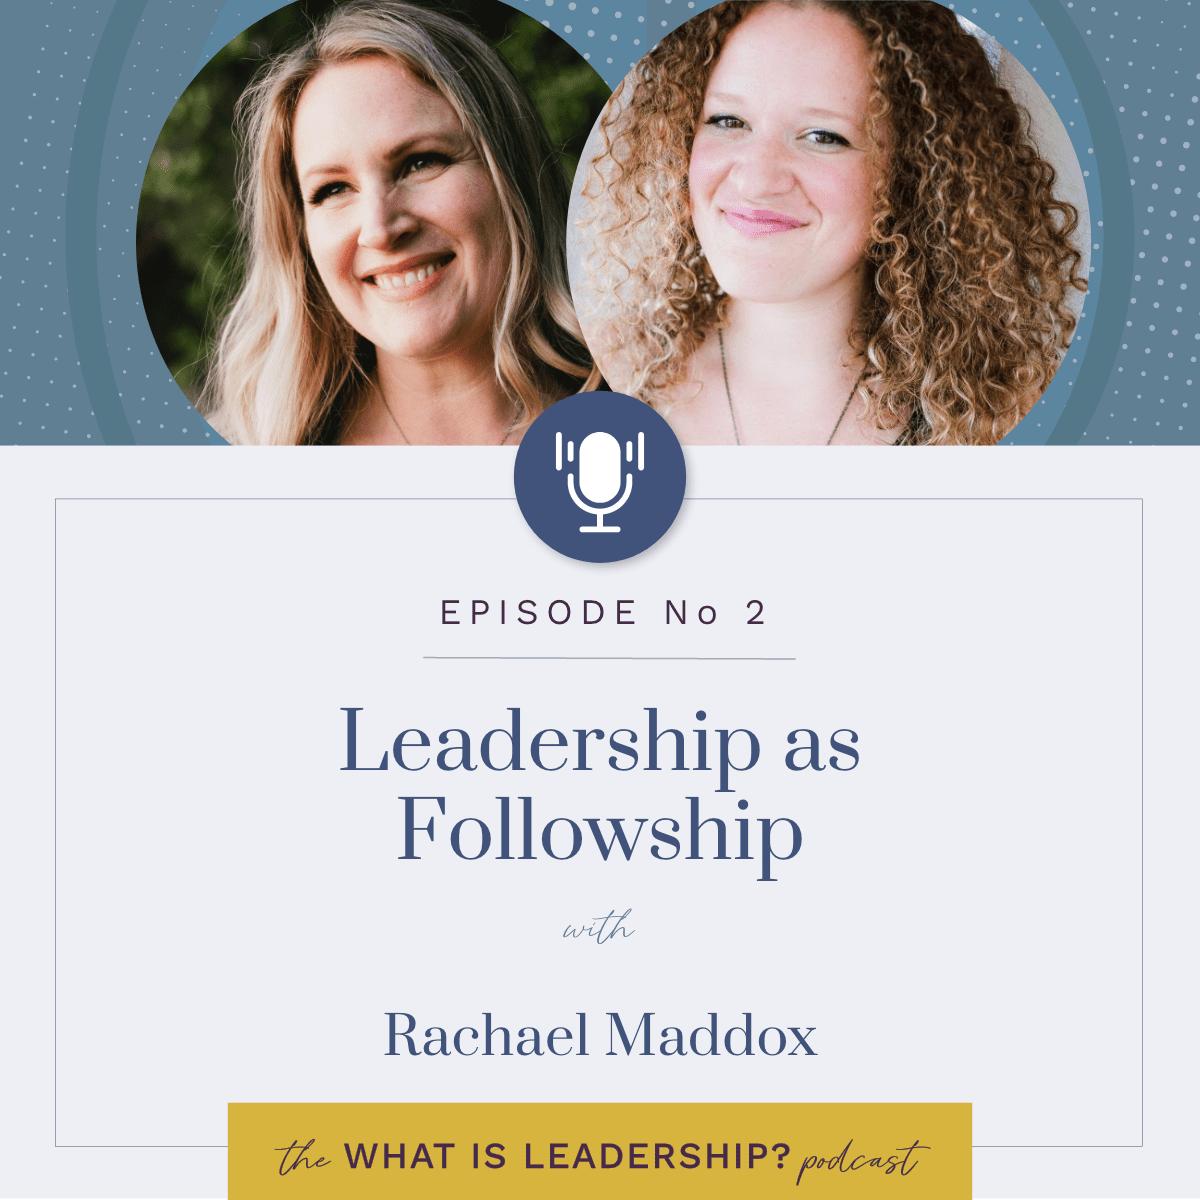 02 – Leadership as Followship – with Rachael Maddox